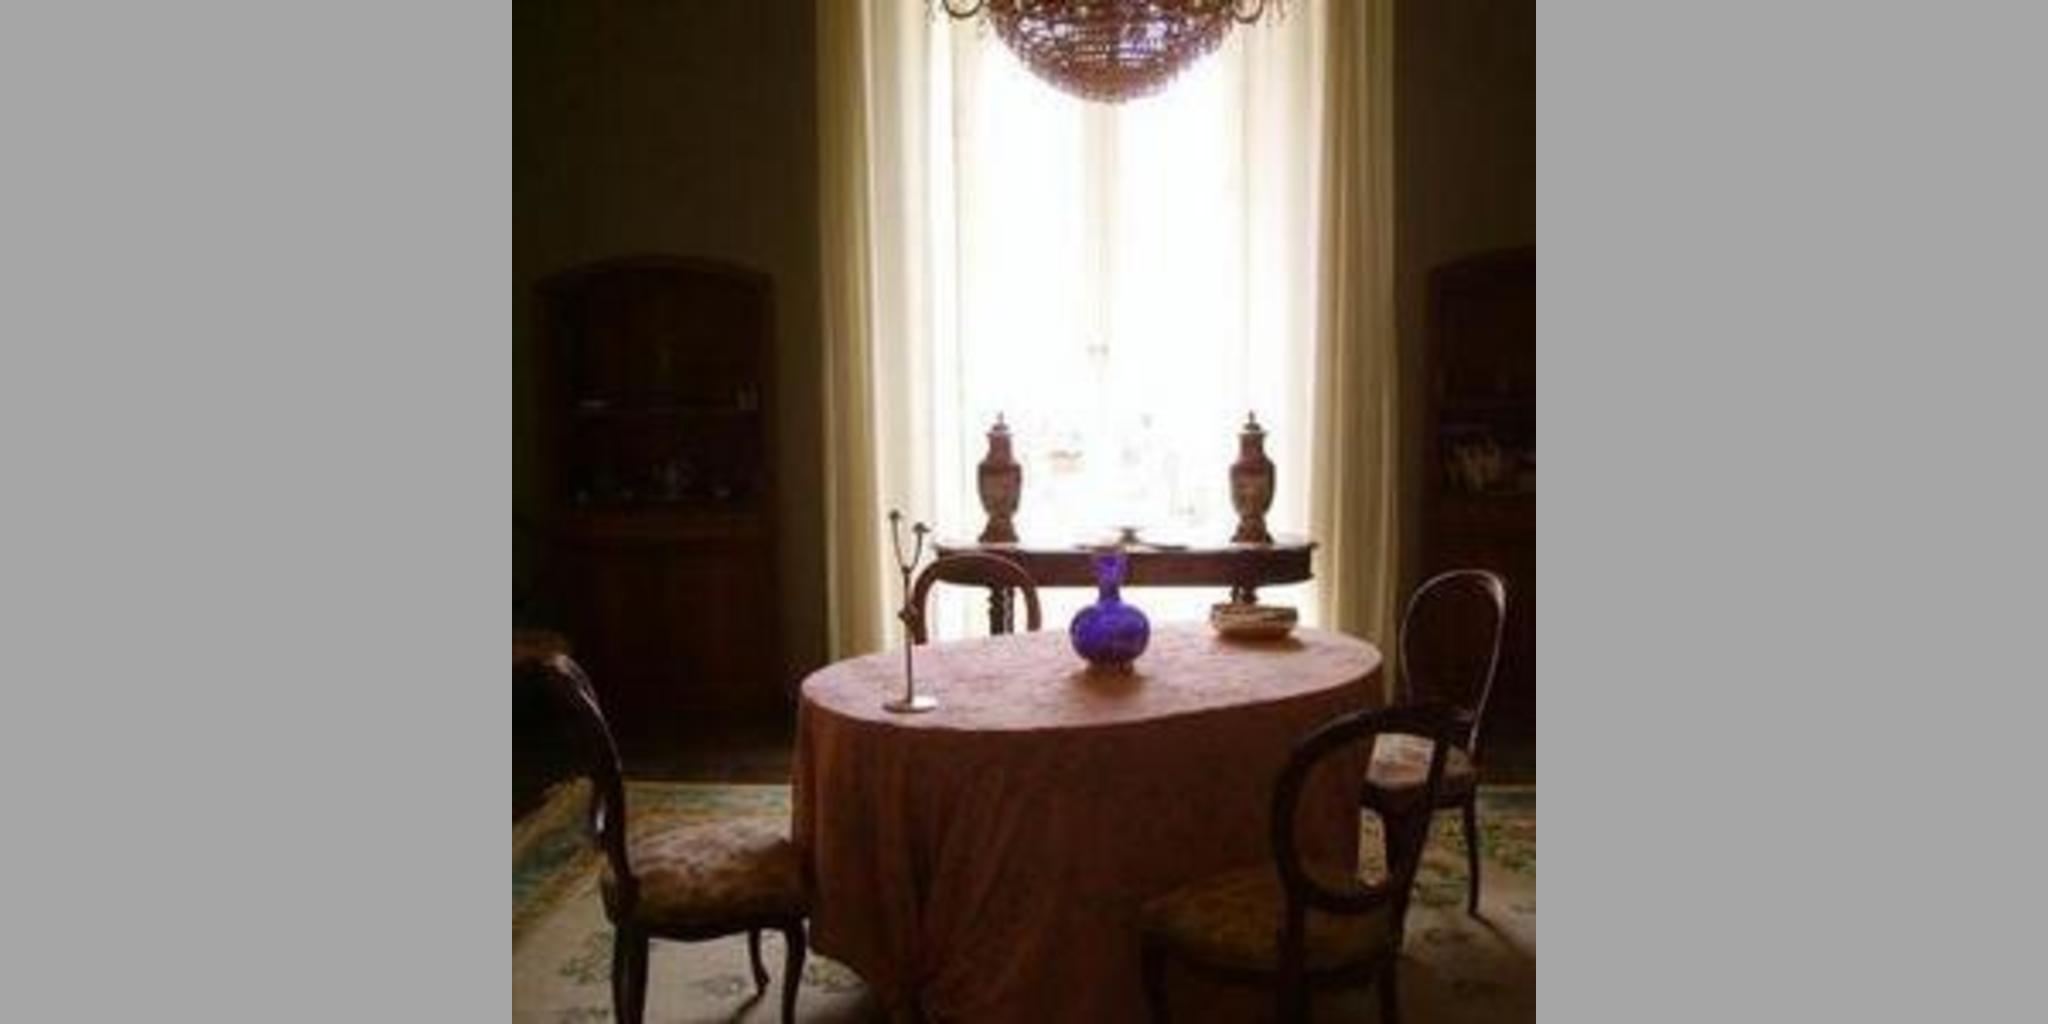 Bed & Breakfast Ruvo Di Puglia - In Palazzo Storico A Ruvo